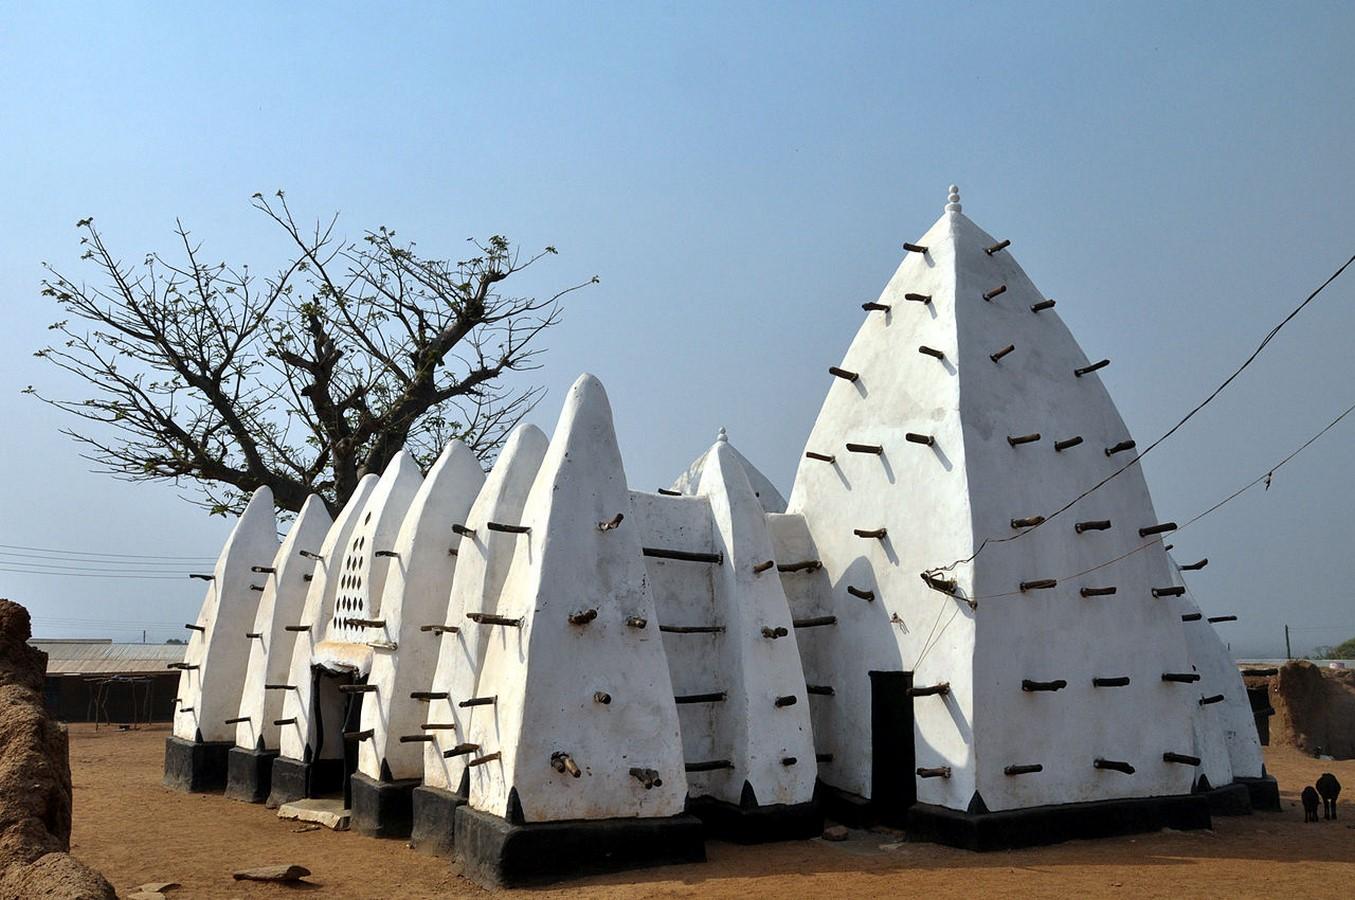 Characteristics of Sudano-Sahelian architecture - Sheet13